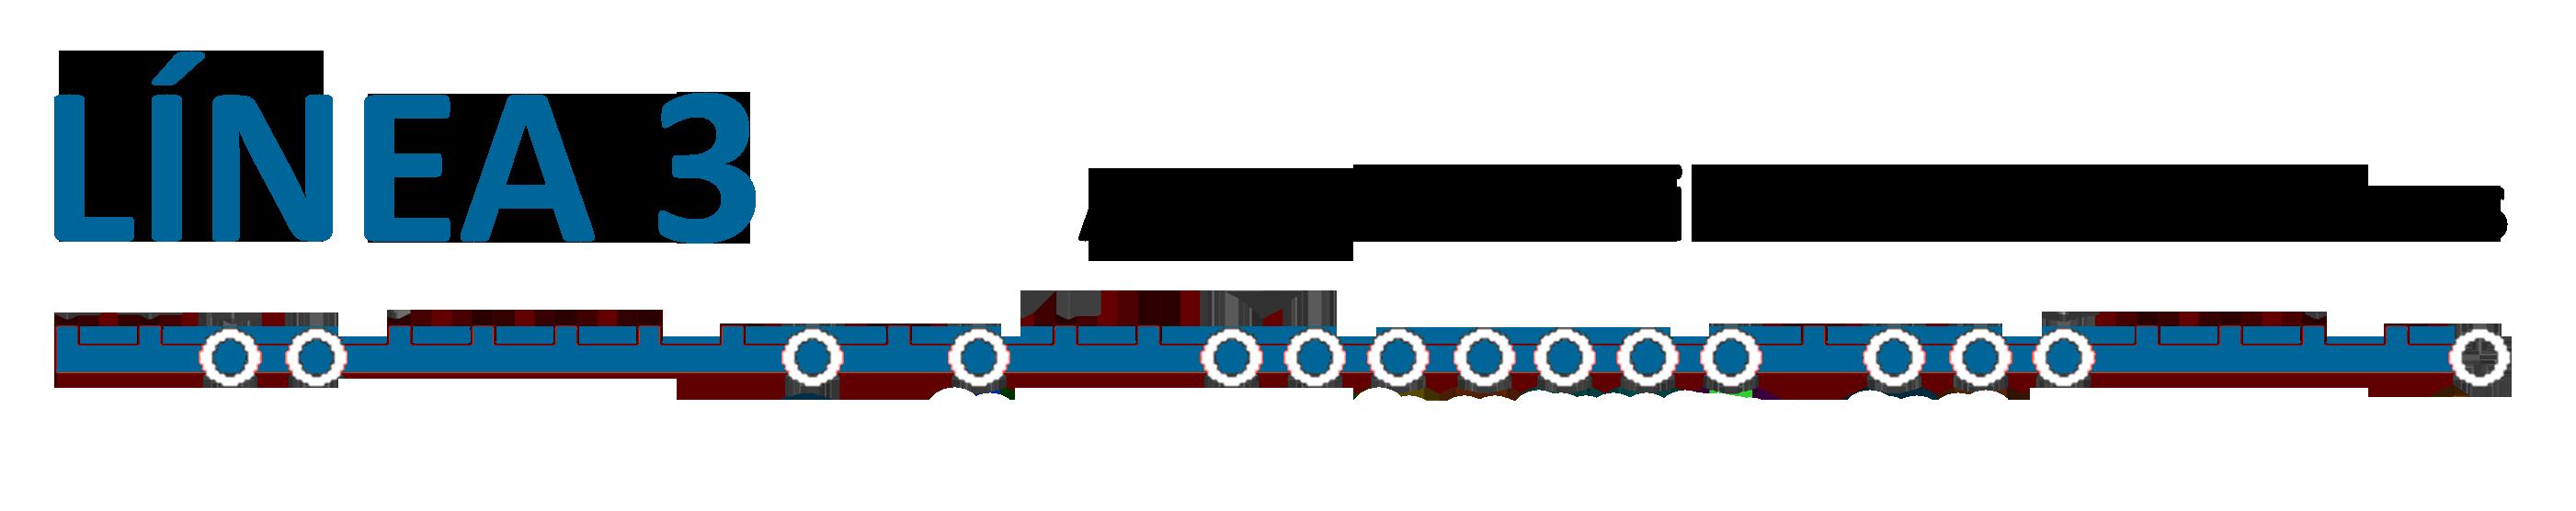 Linea3_web